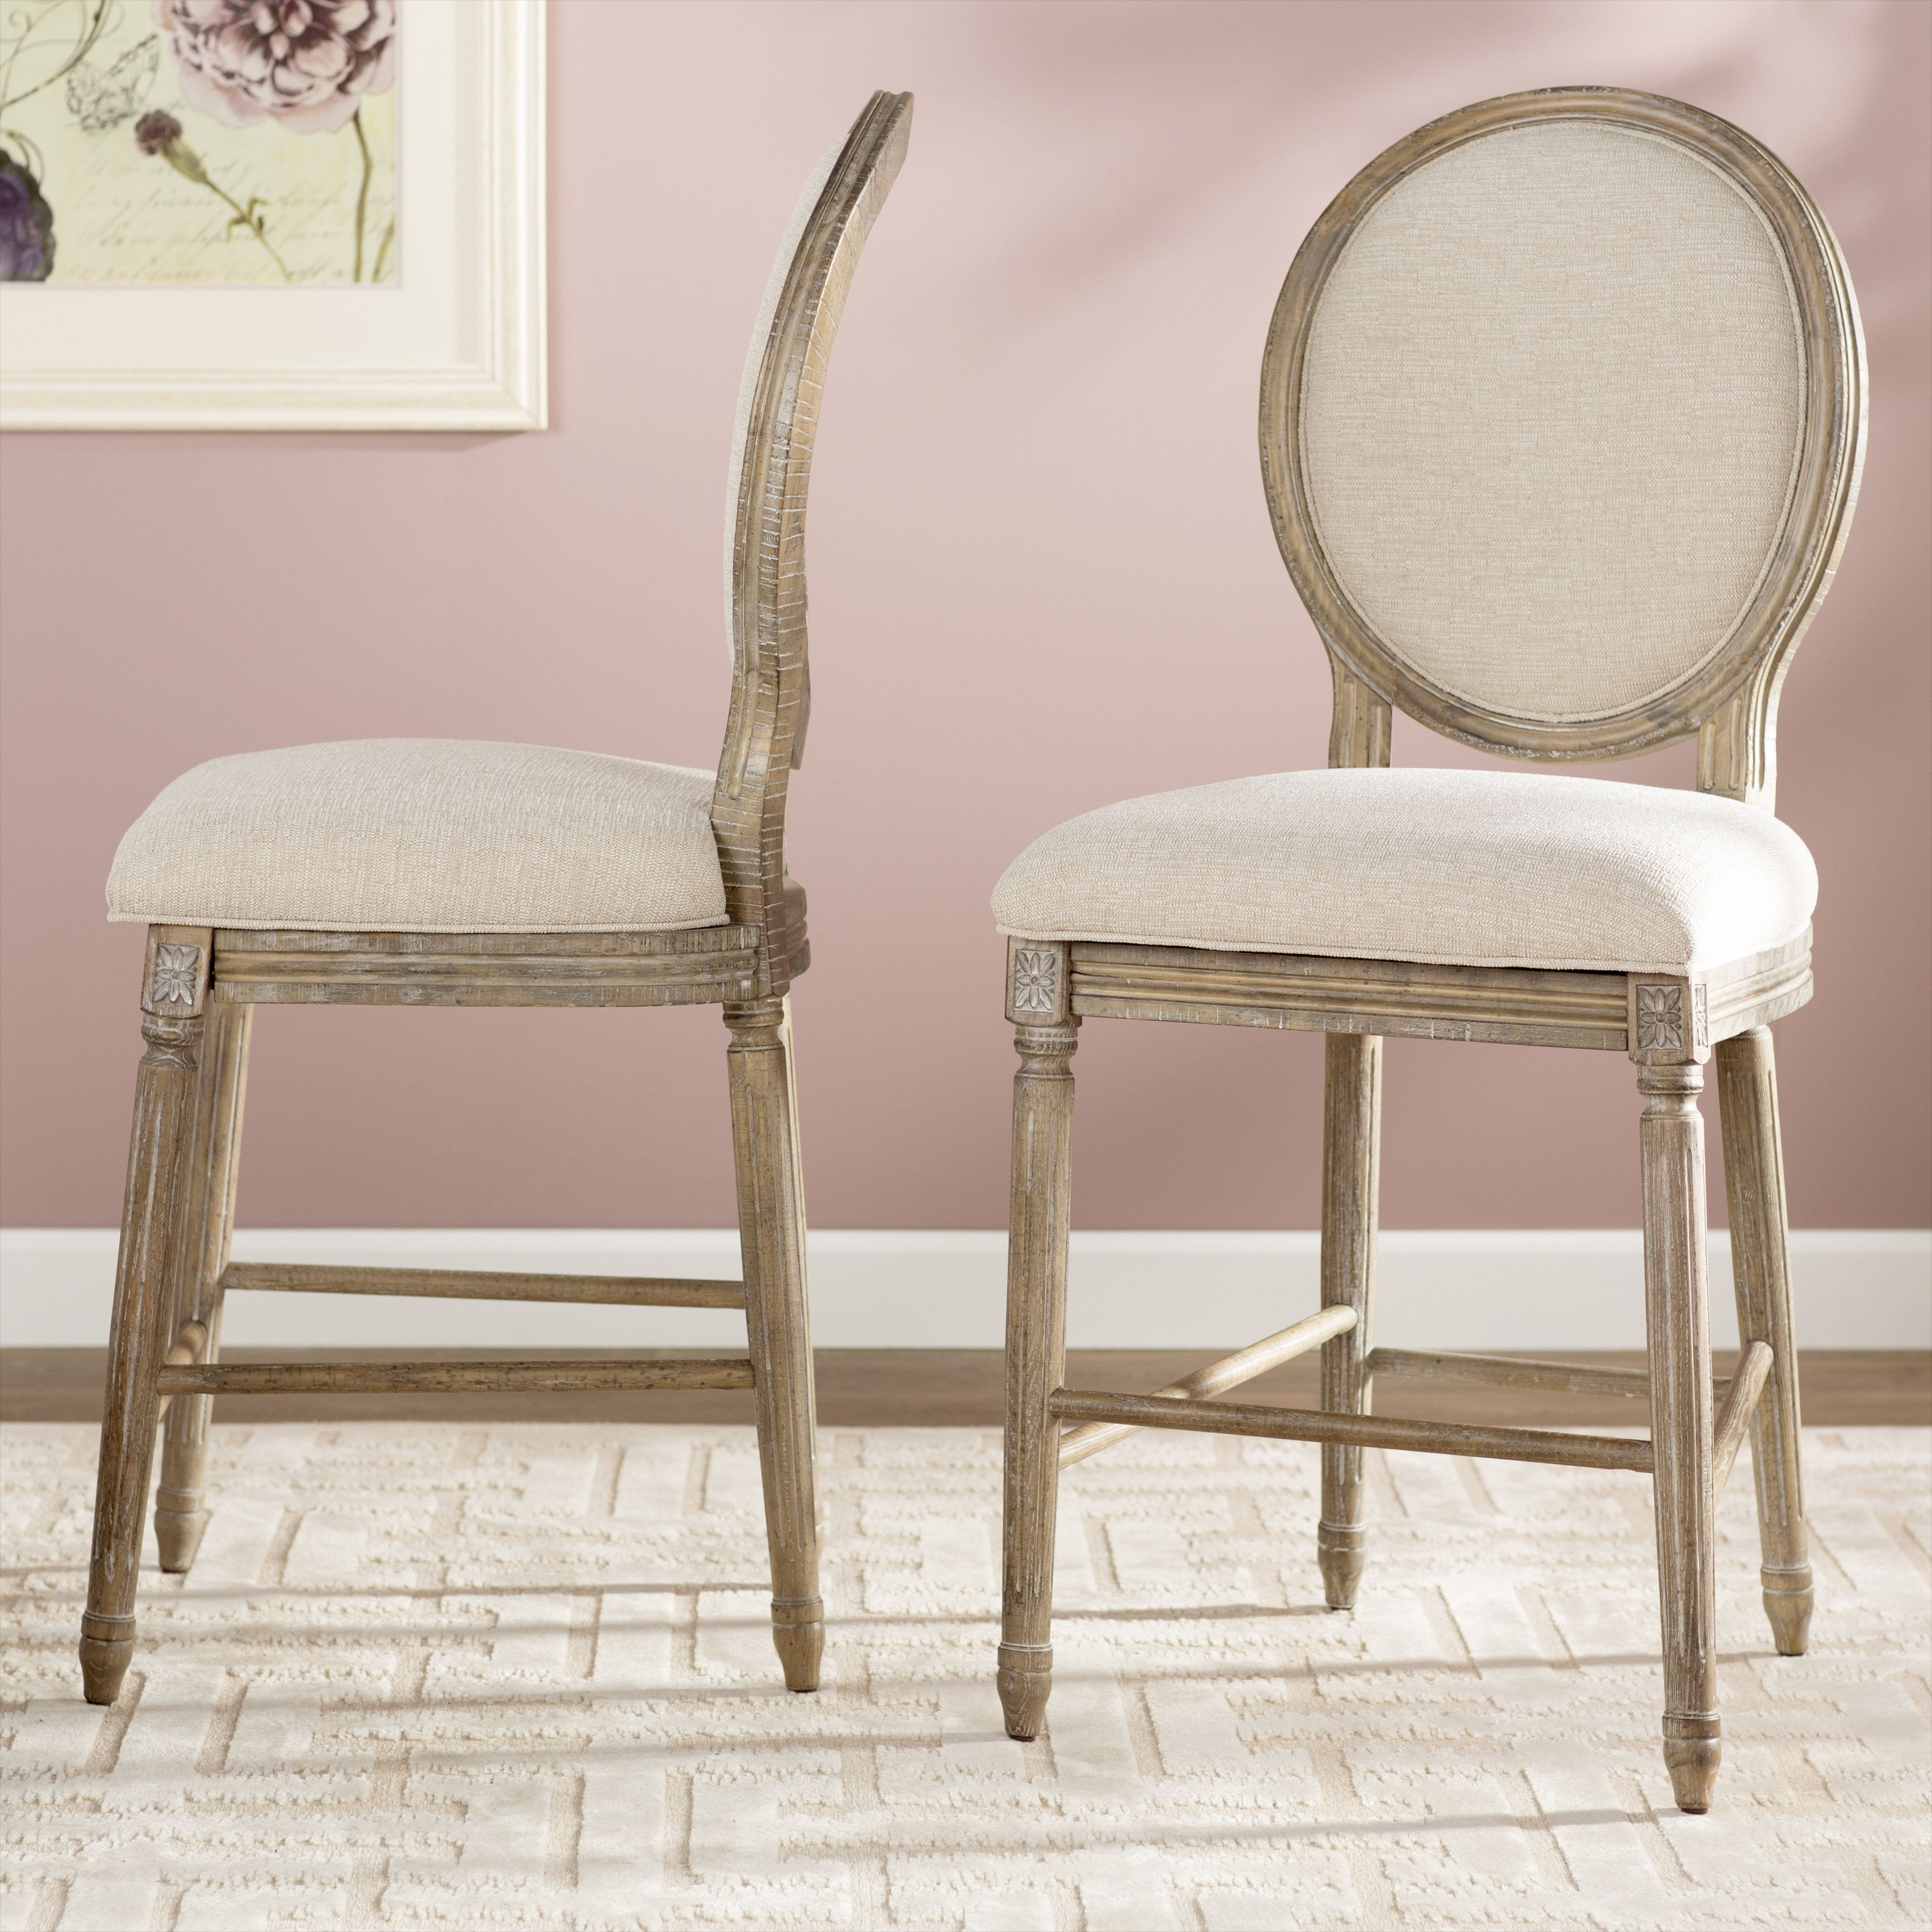 Terrific Bedard 24 Bar Stool In 2019 Barstools Counter Height Ncnpc Chair Design For Home Ncnpcorg